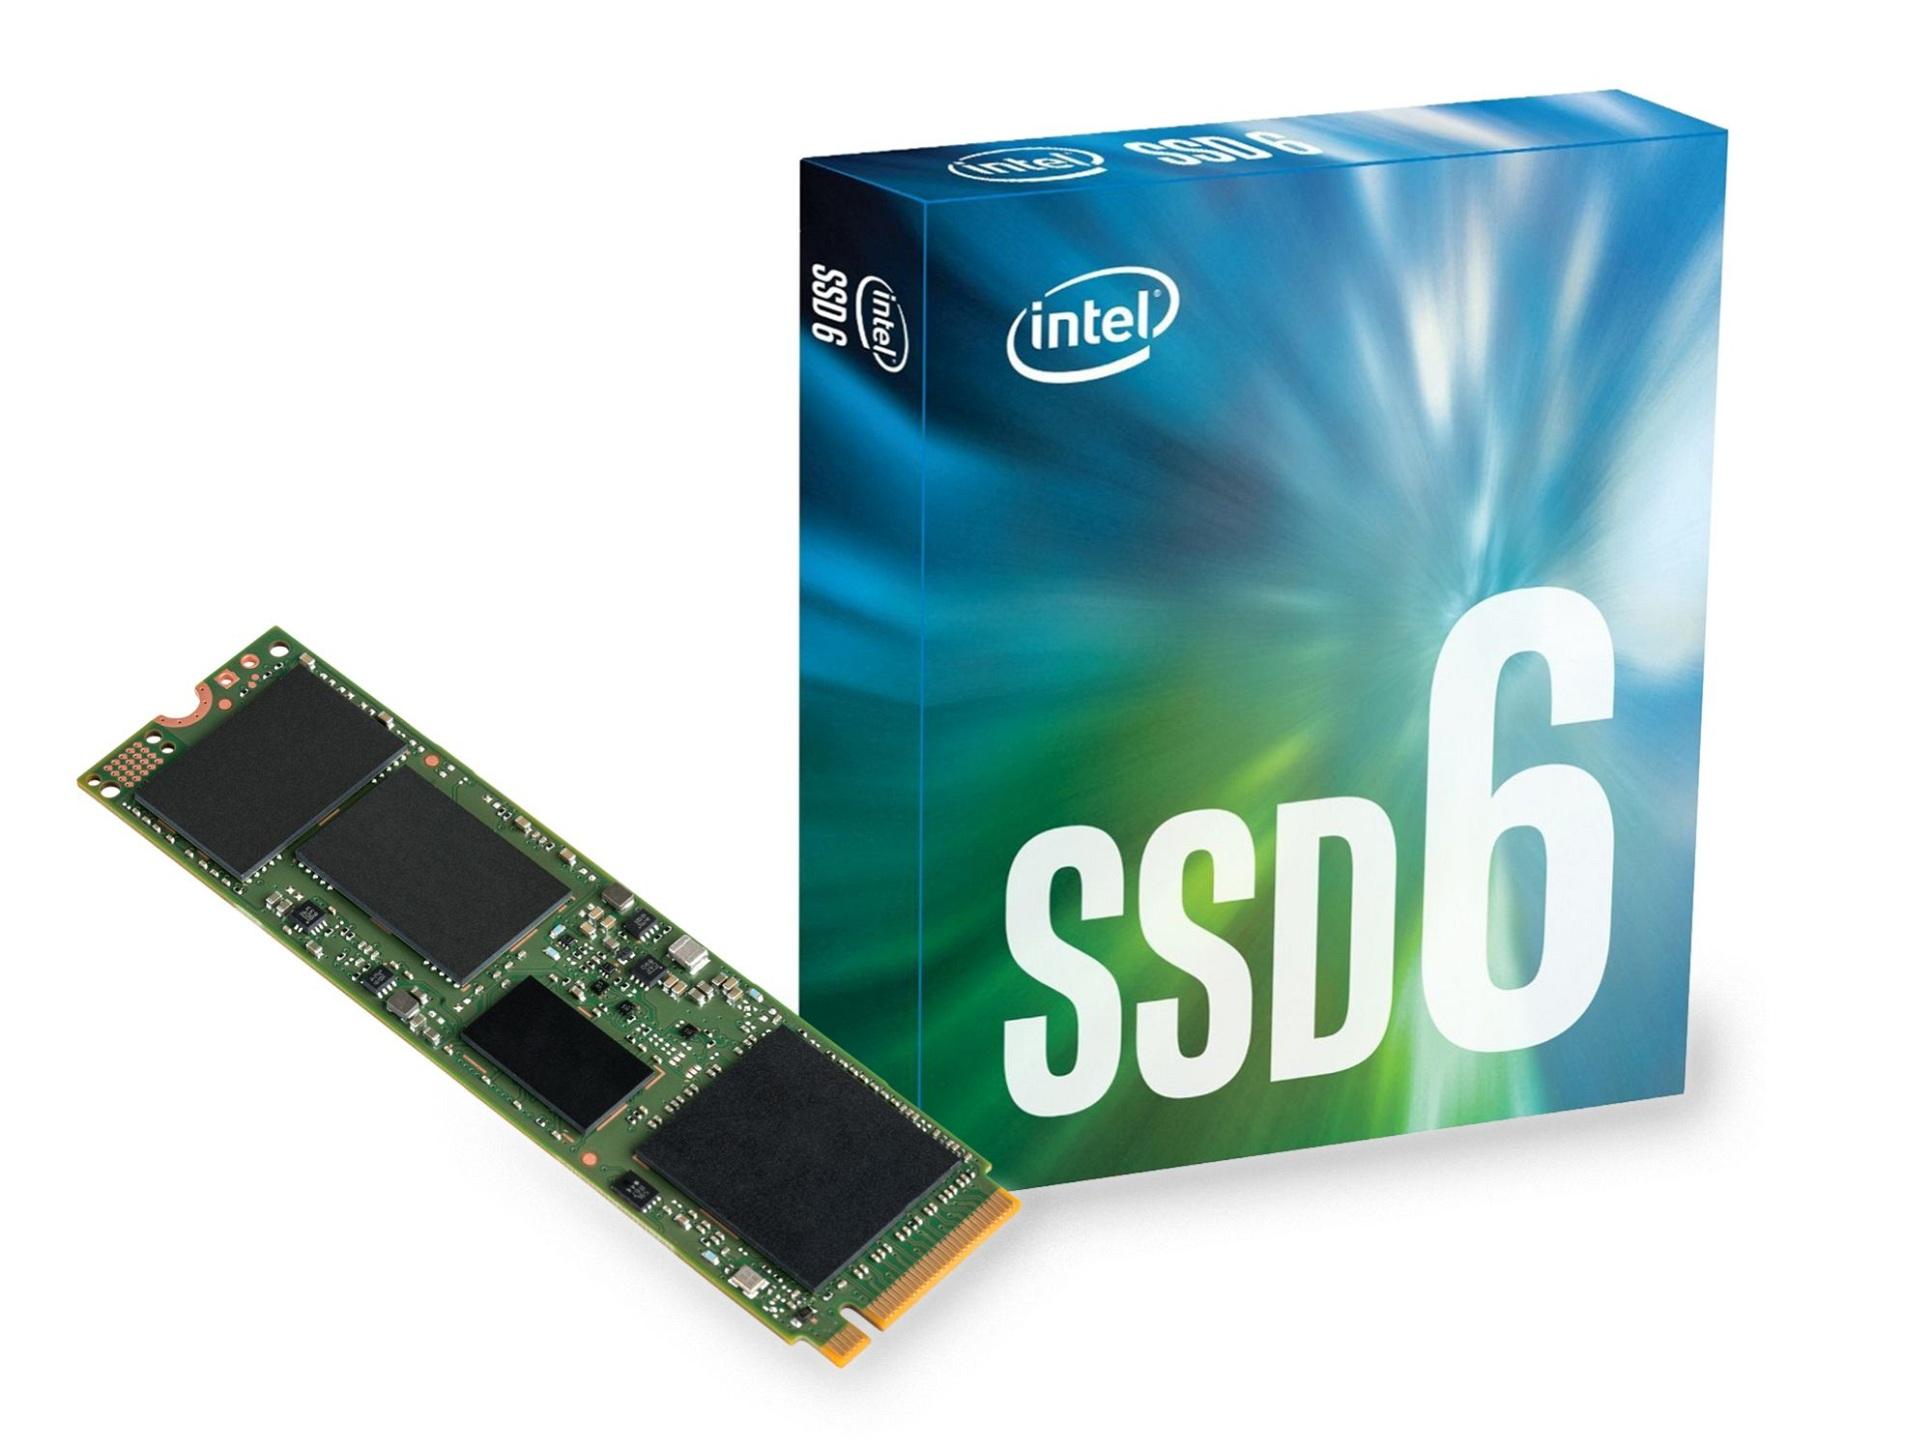 Asus 03B03-00037600 SSD Festplatte 128GB (M.2 22 x 80 mm) PCIe NVMe 3.0 x4